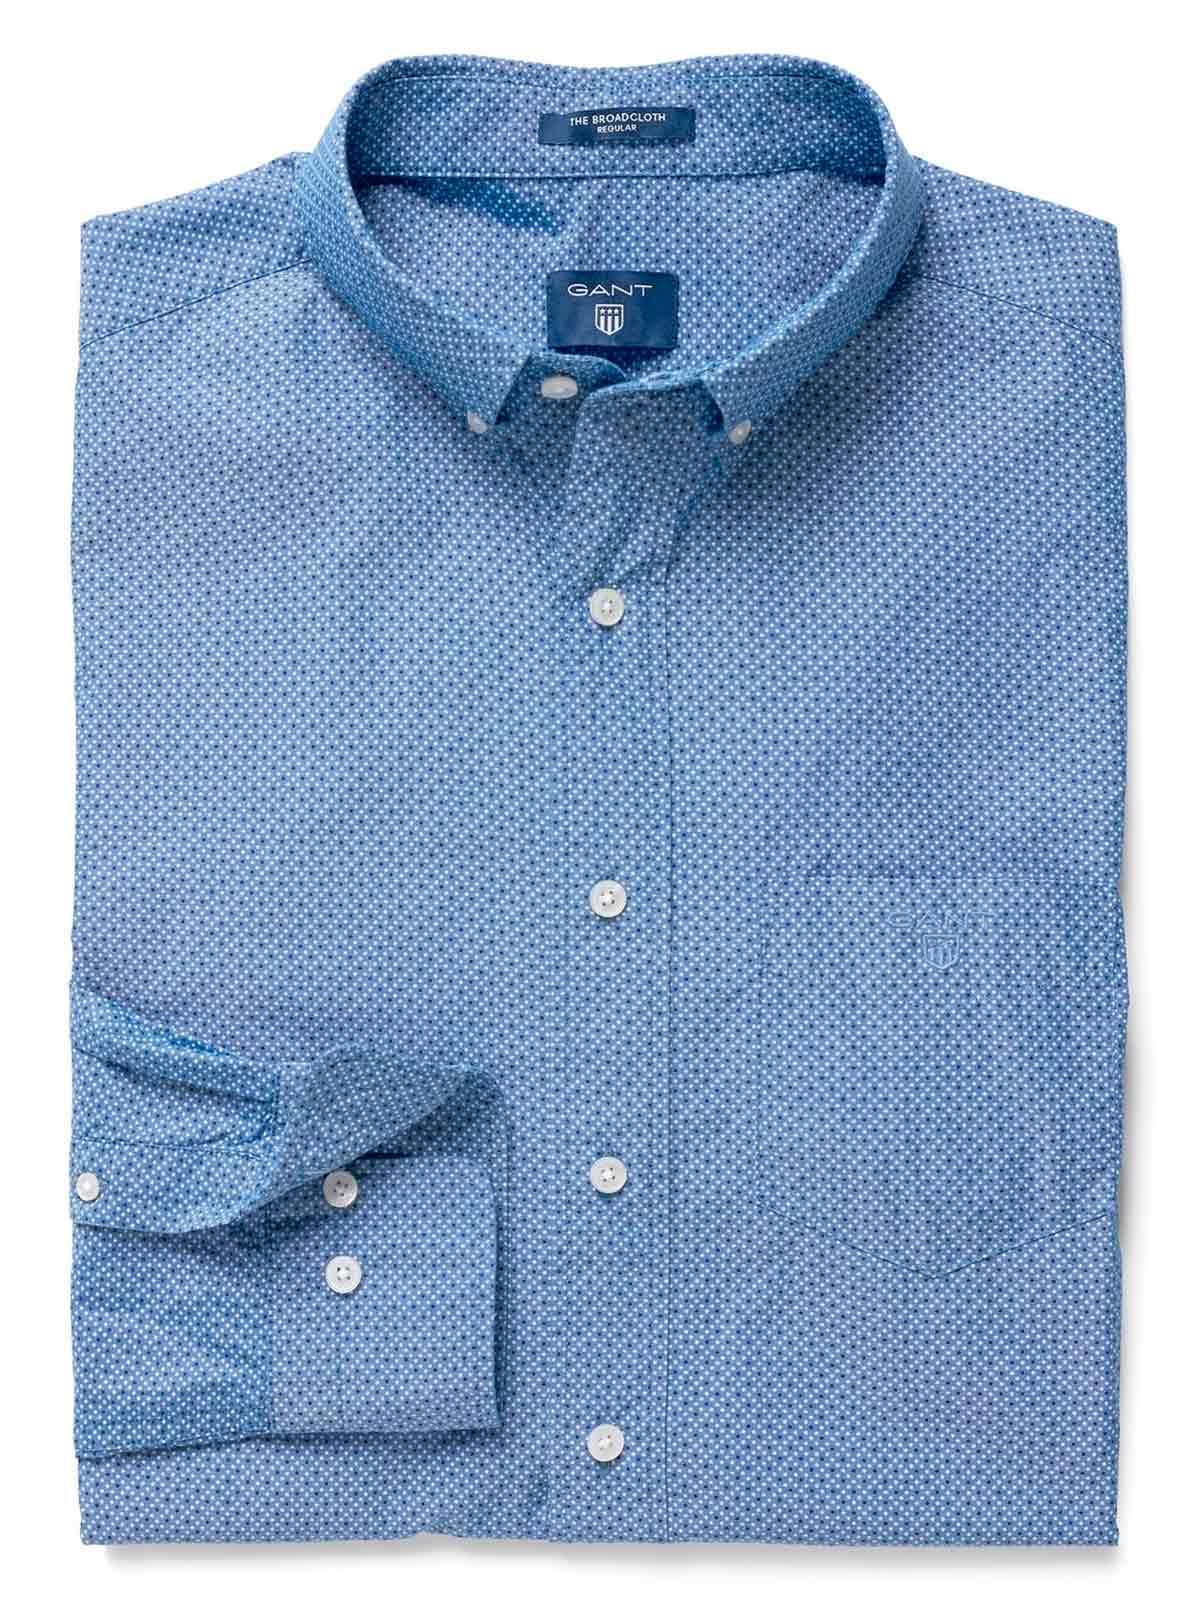 Picture of GANT   Men's Broadcloth Dot Shirt